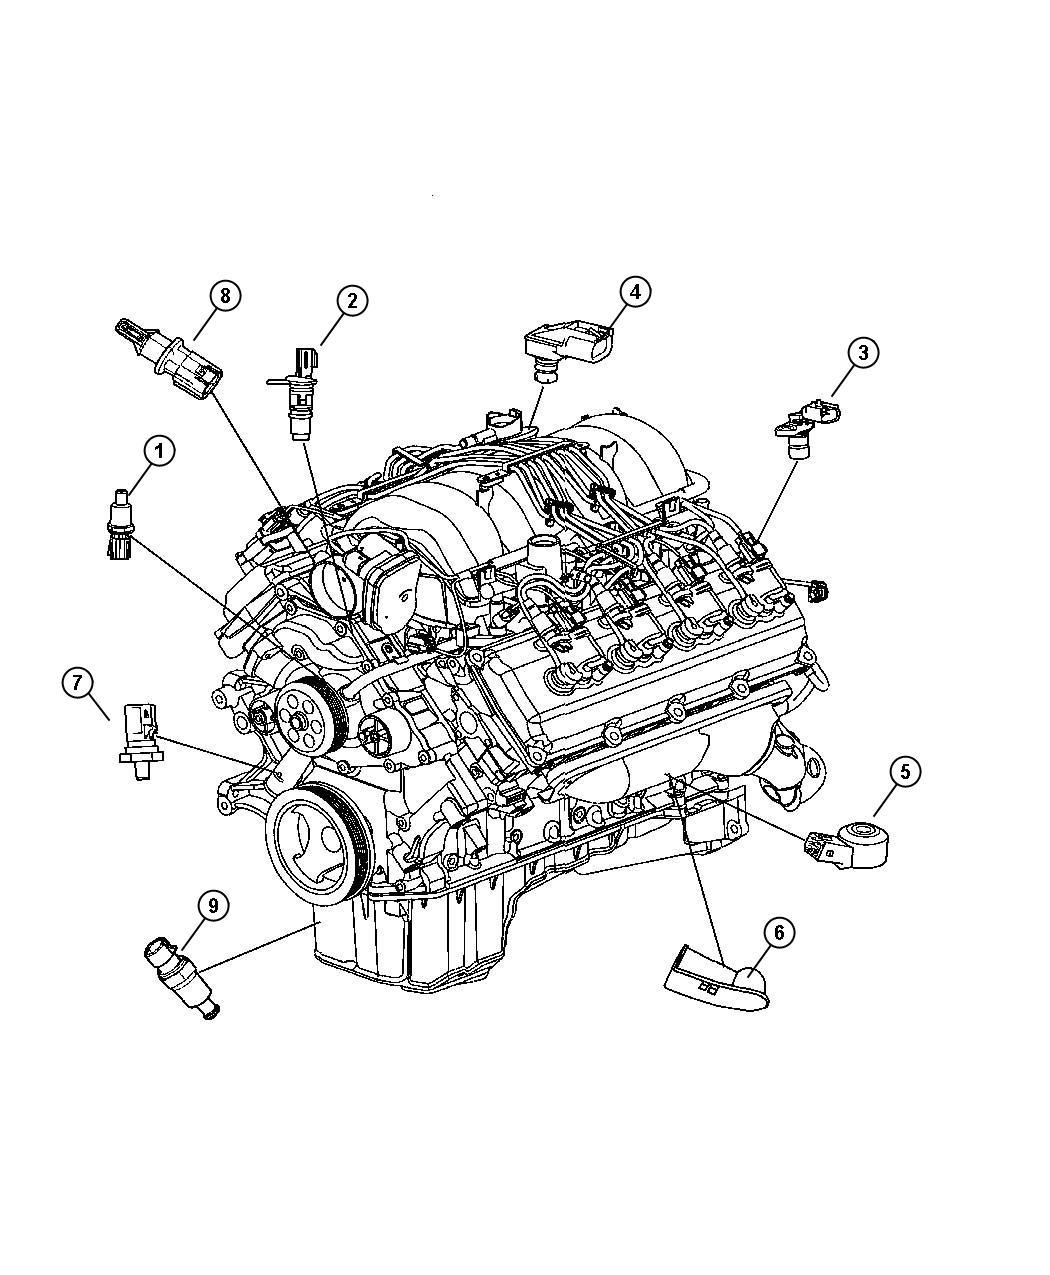 Honda ac pressor oil moreover 2010 chrysler 300 2 7l engine diagram furthermore 2005 dodge ram